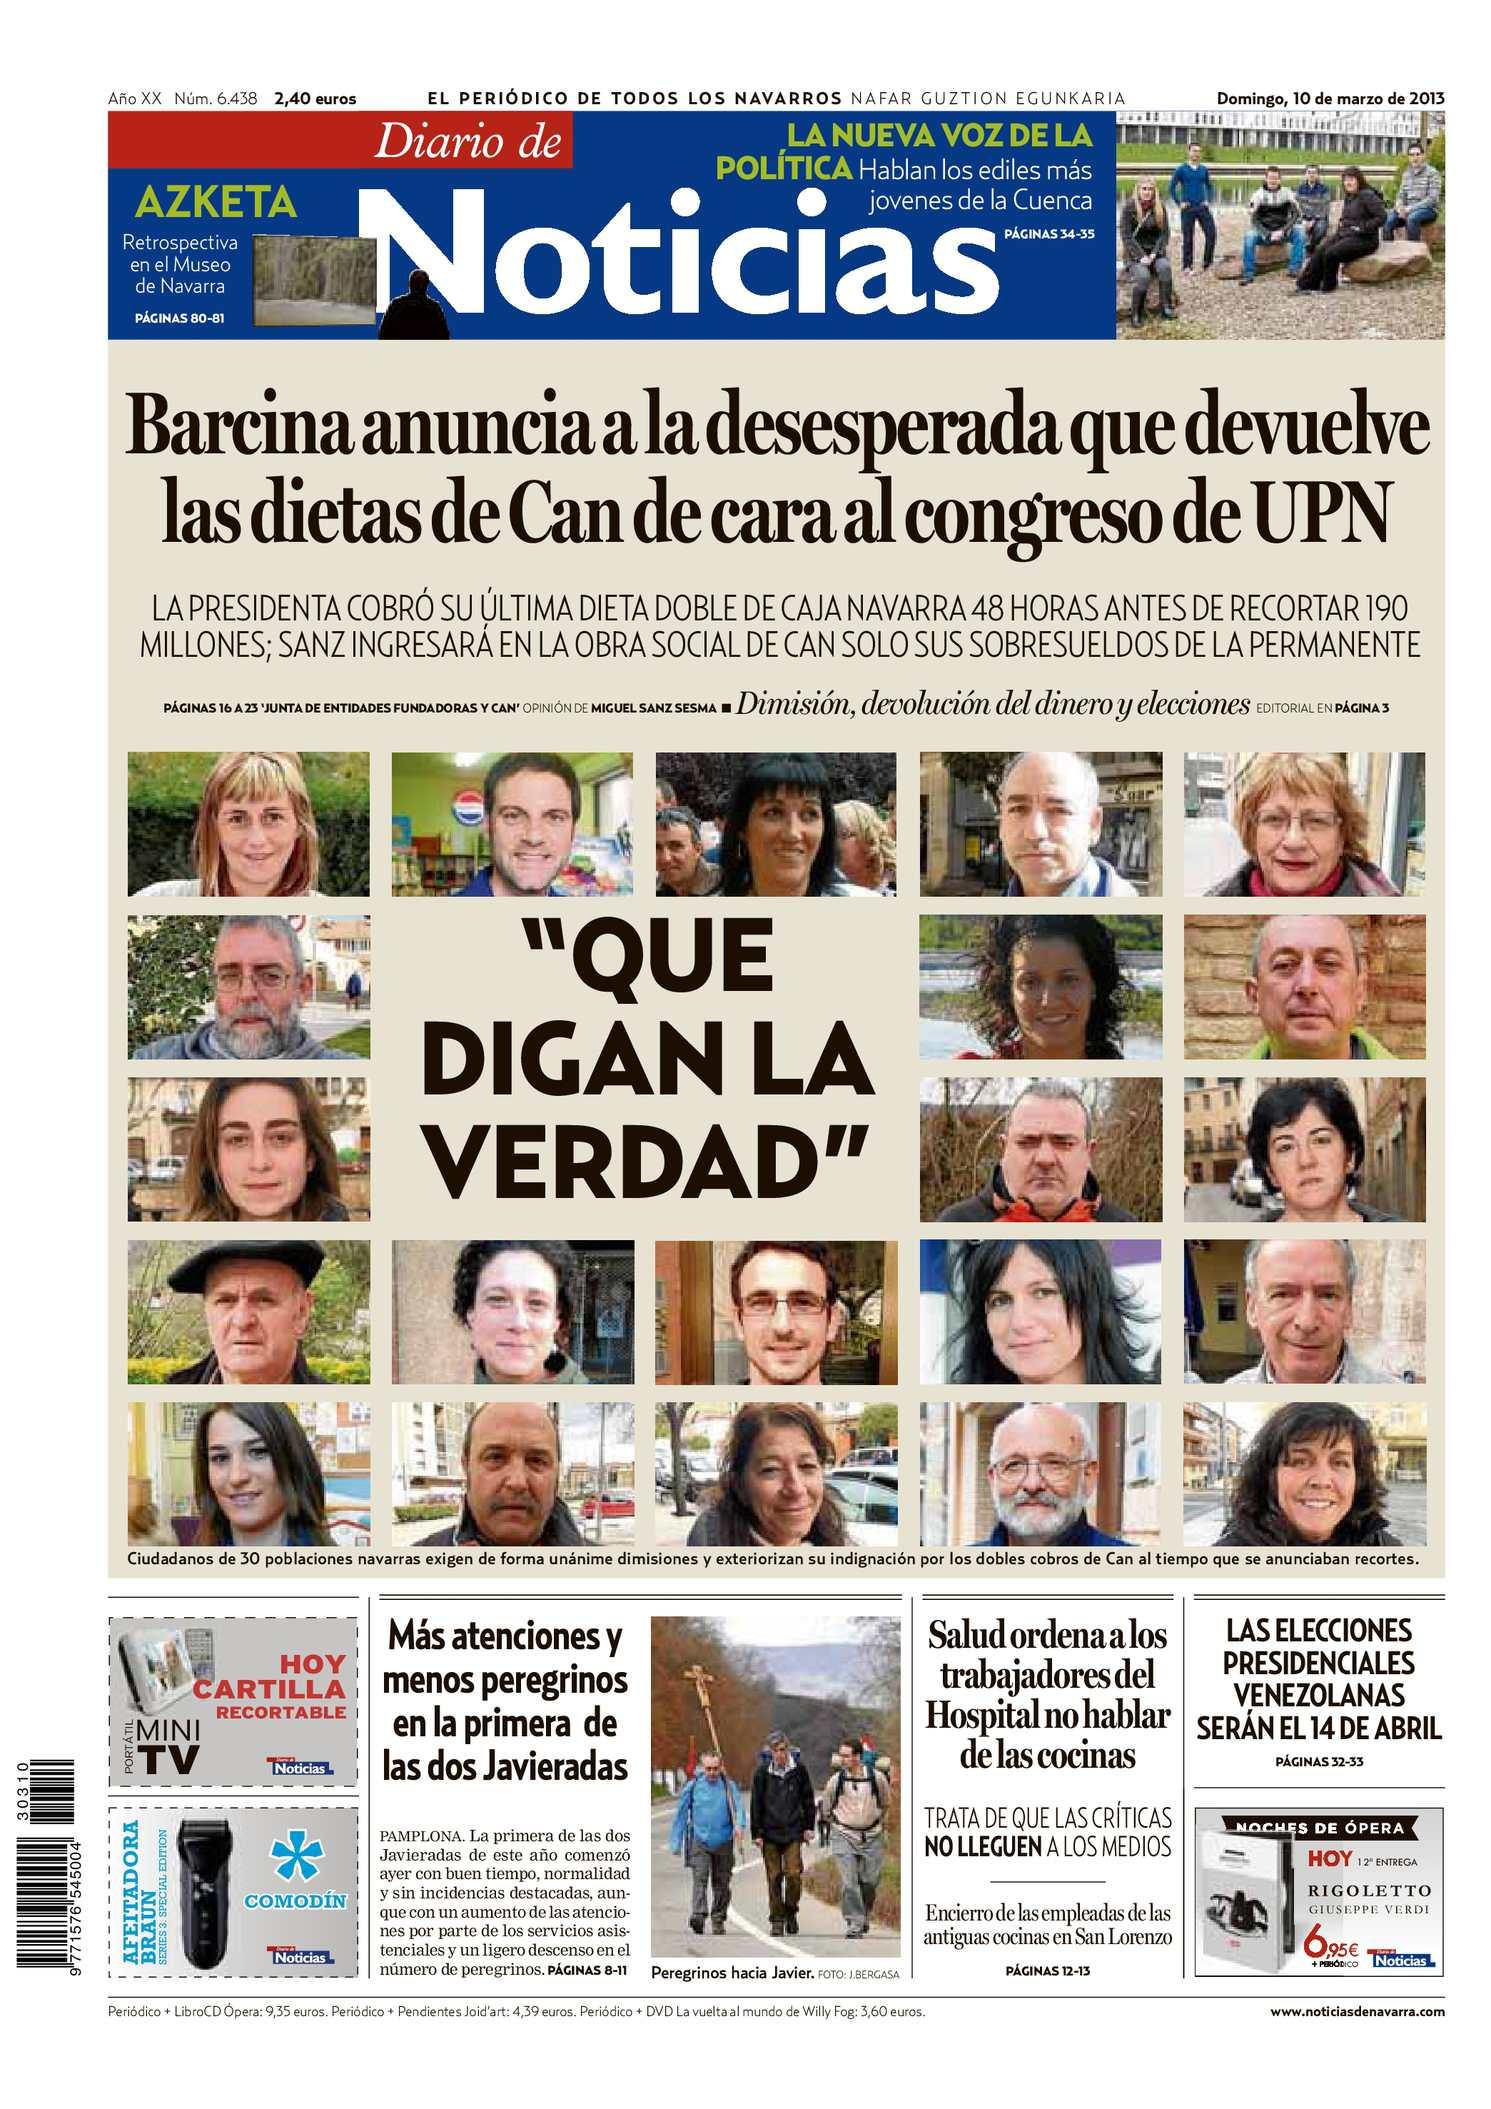 Calaméo - Diario de Noticias 20130310 fb070c42d5f75